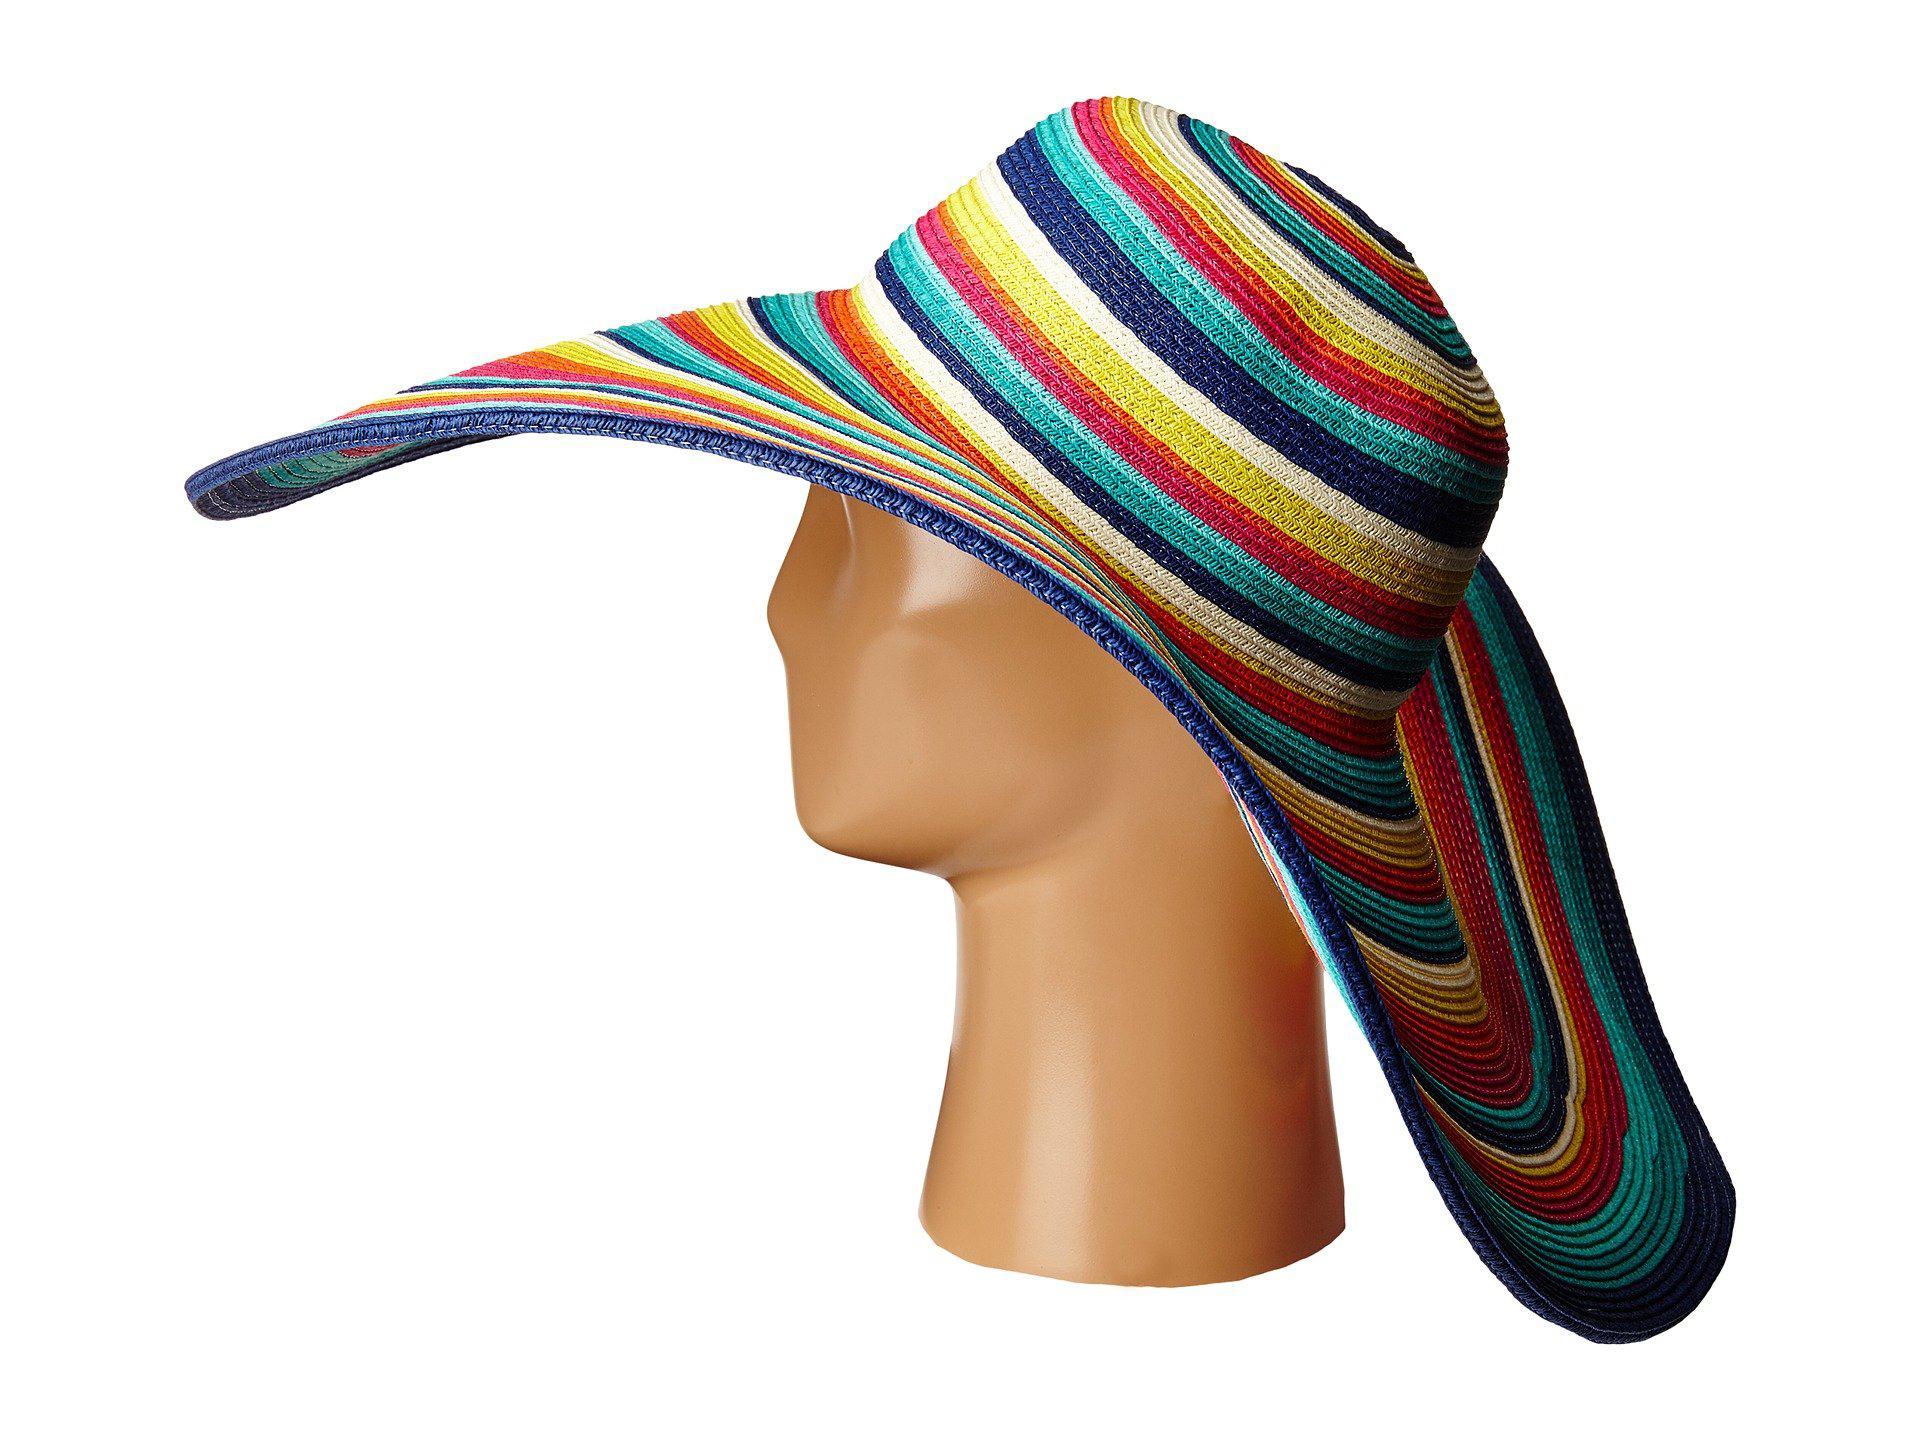 47770206215 San Diego Hat Company - Multicolor Ubx2721 Striped Floppy 8 Inch Brim Sun  Hat (multi. View fullscreen